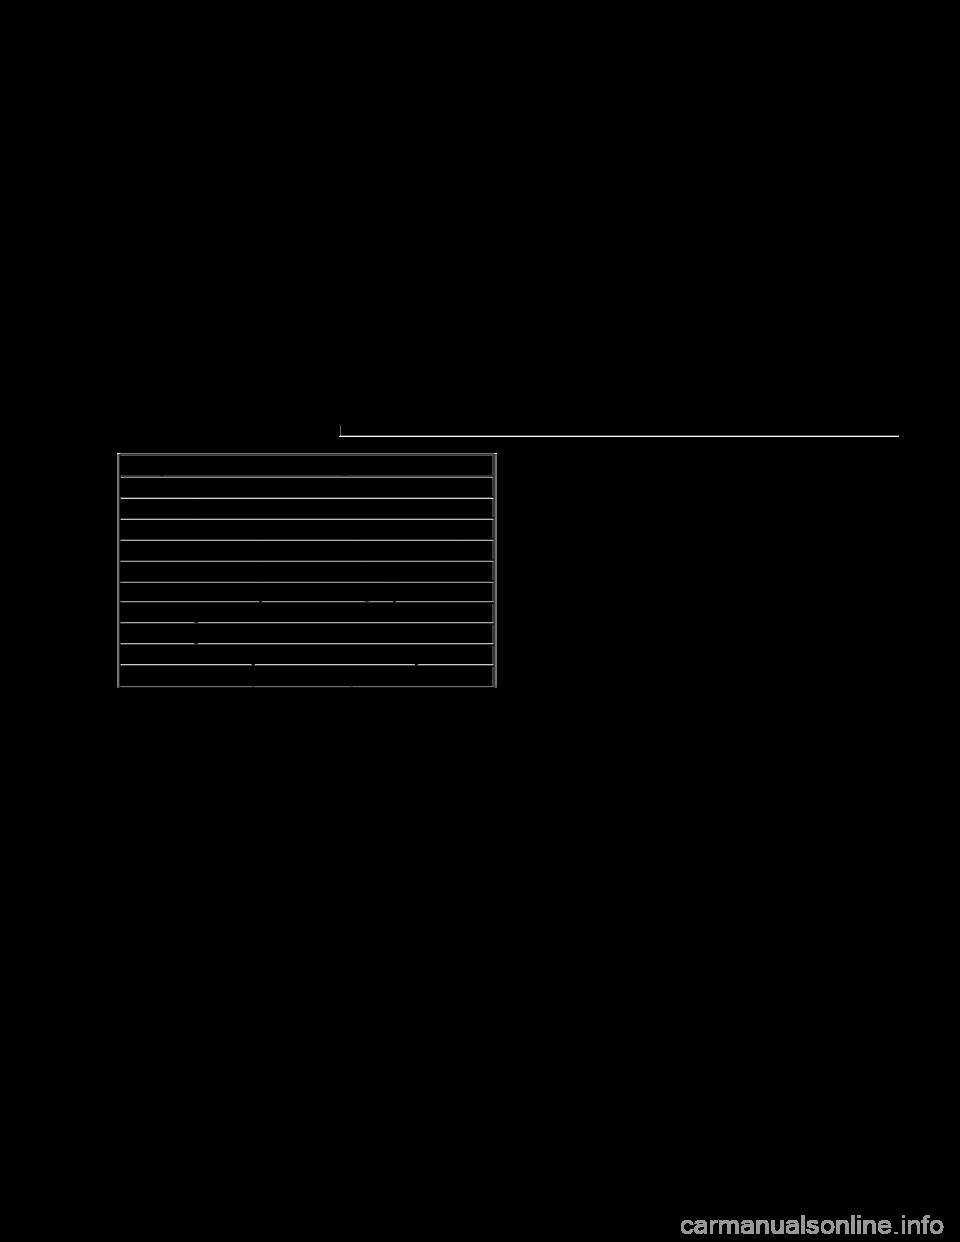 2005 Scion Xa Wiring Diagram Free Download Manual Of 2006 Fuse Box Tc Intermatic T101r Wire